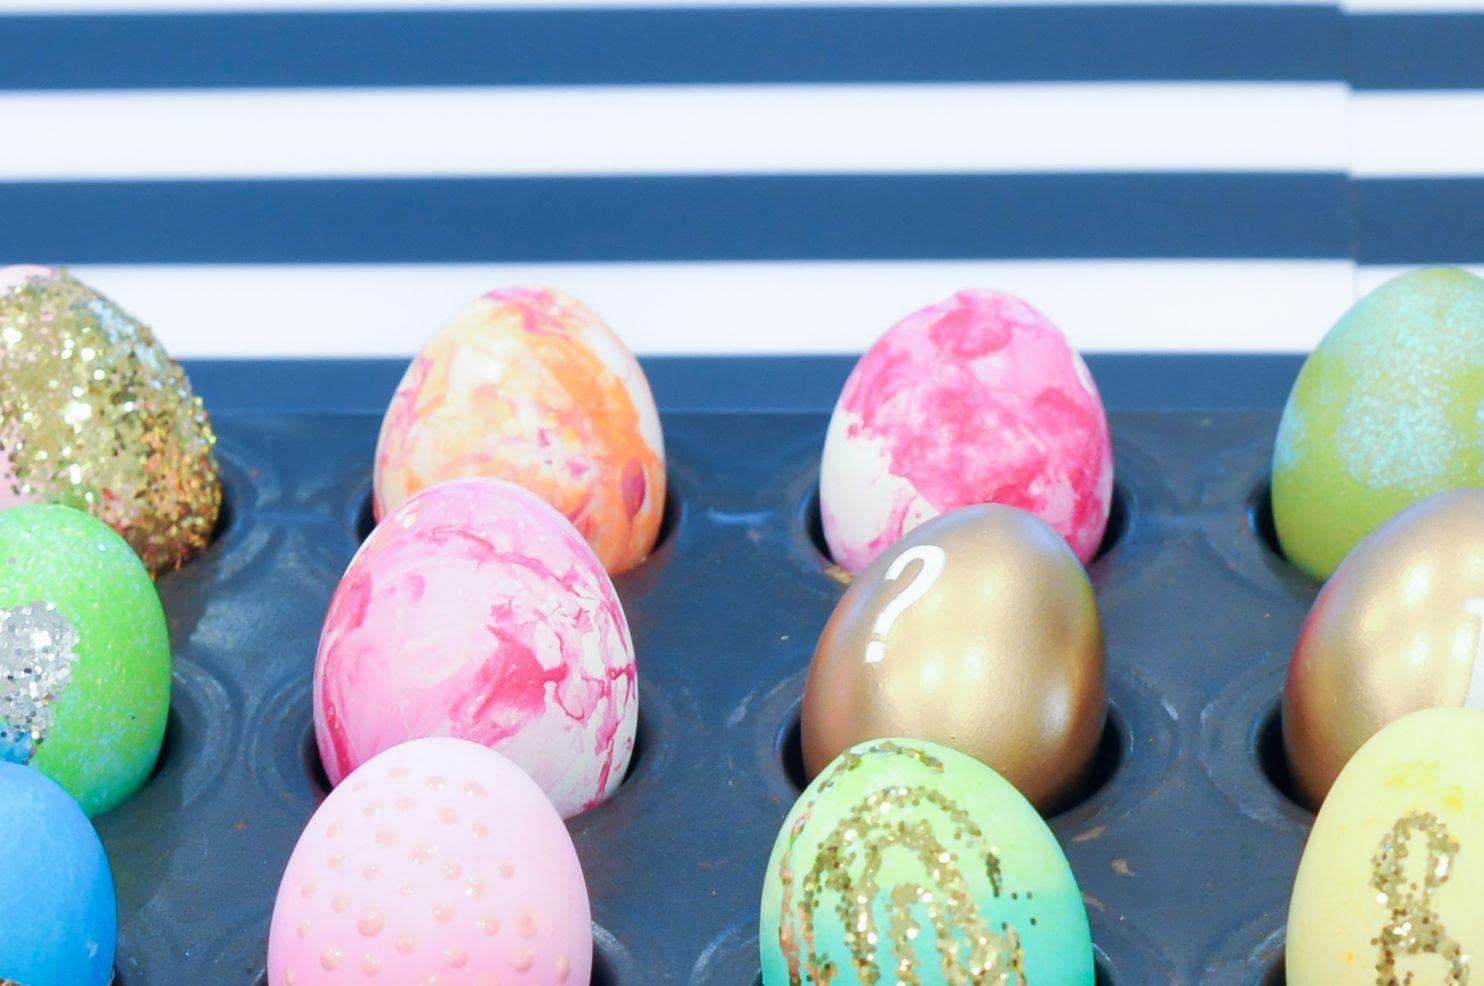 photo cropped eggs-1120_zpsjafrsztk.jpg